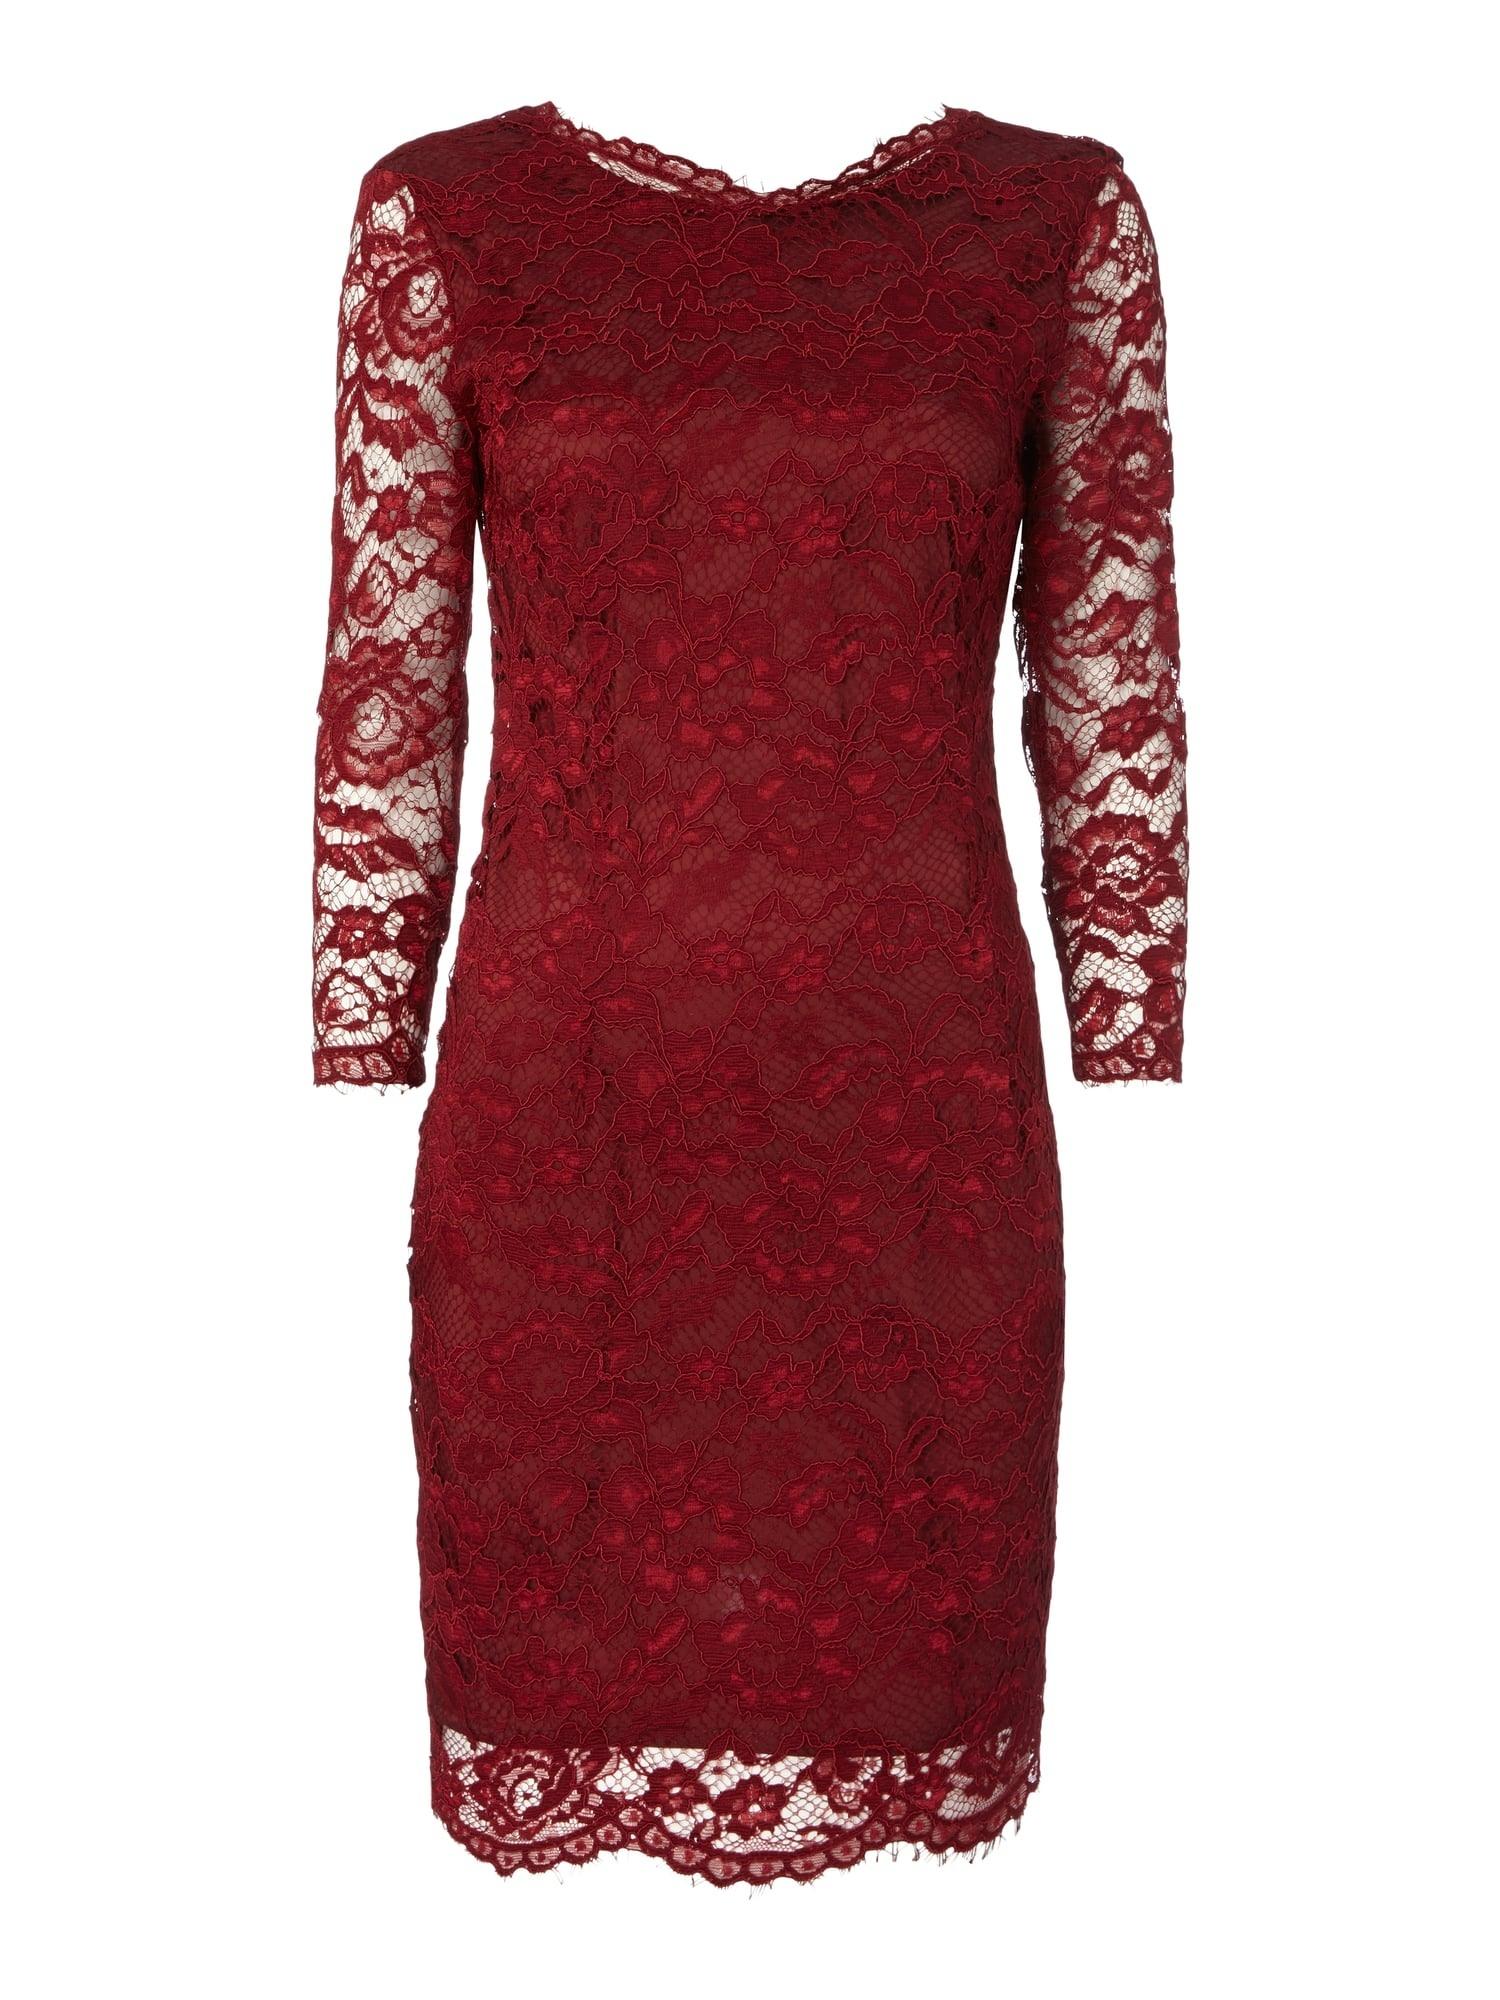 Abend Wunderbar Bordeaux Kleid Spitze Spezialgebiet13 Genial Bordeaux Kleid Spitze Design